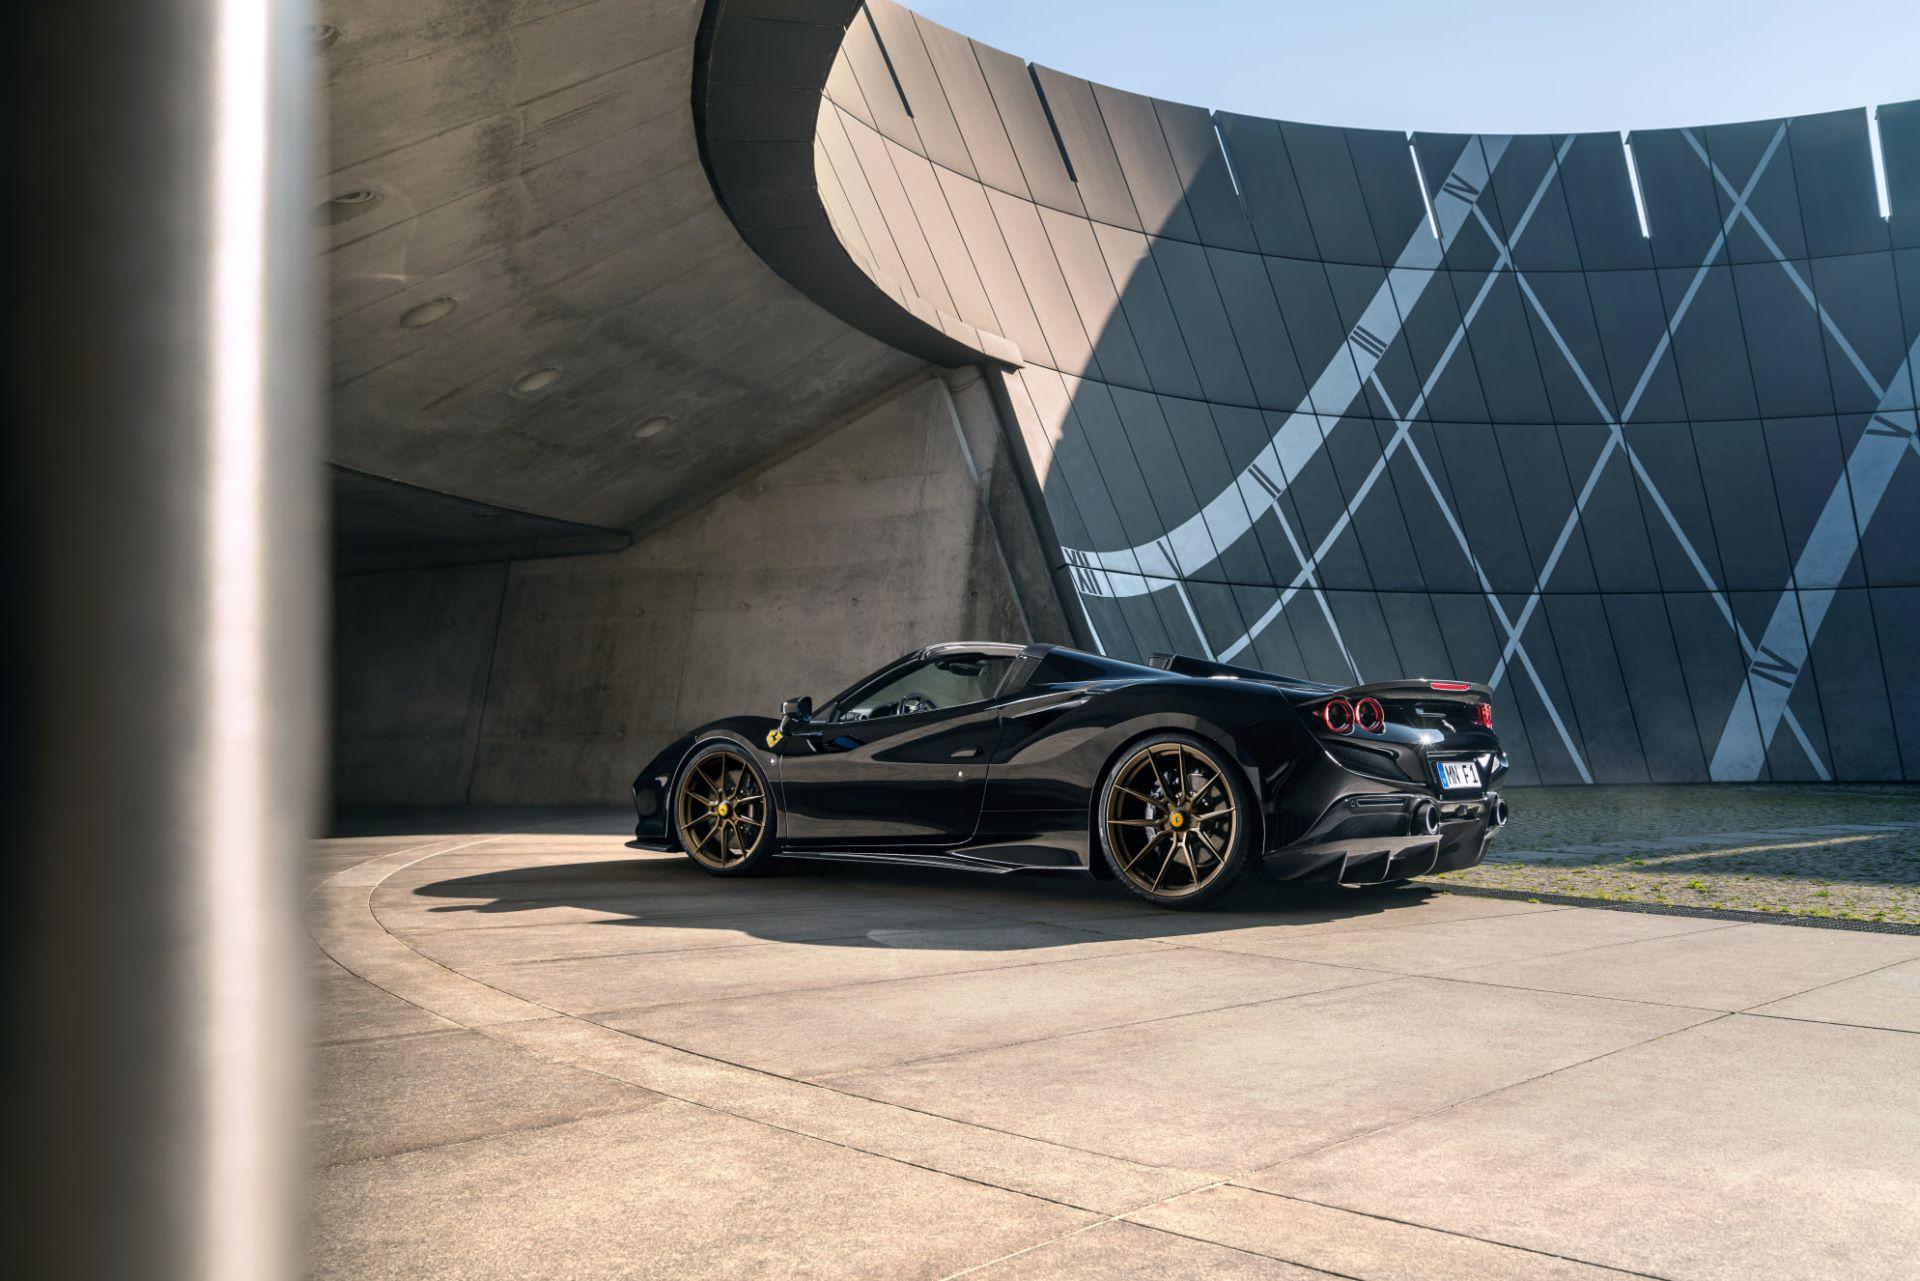 Ferrari-F8-Spider-by-Novitec-6